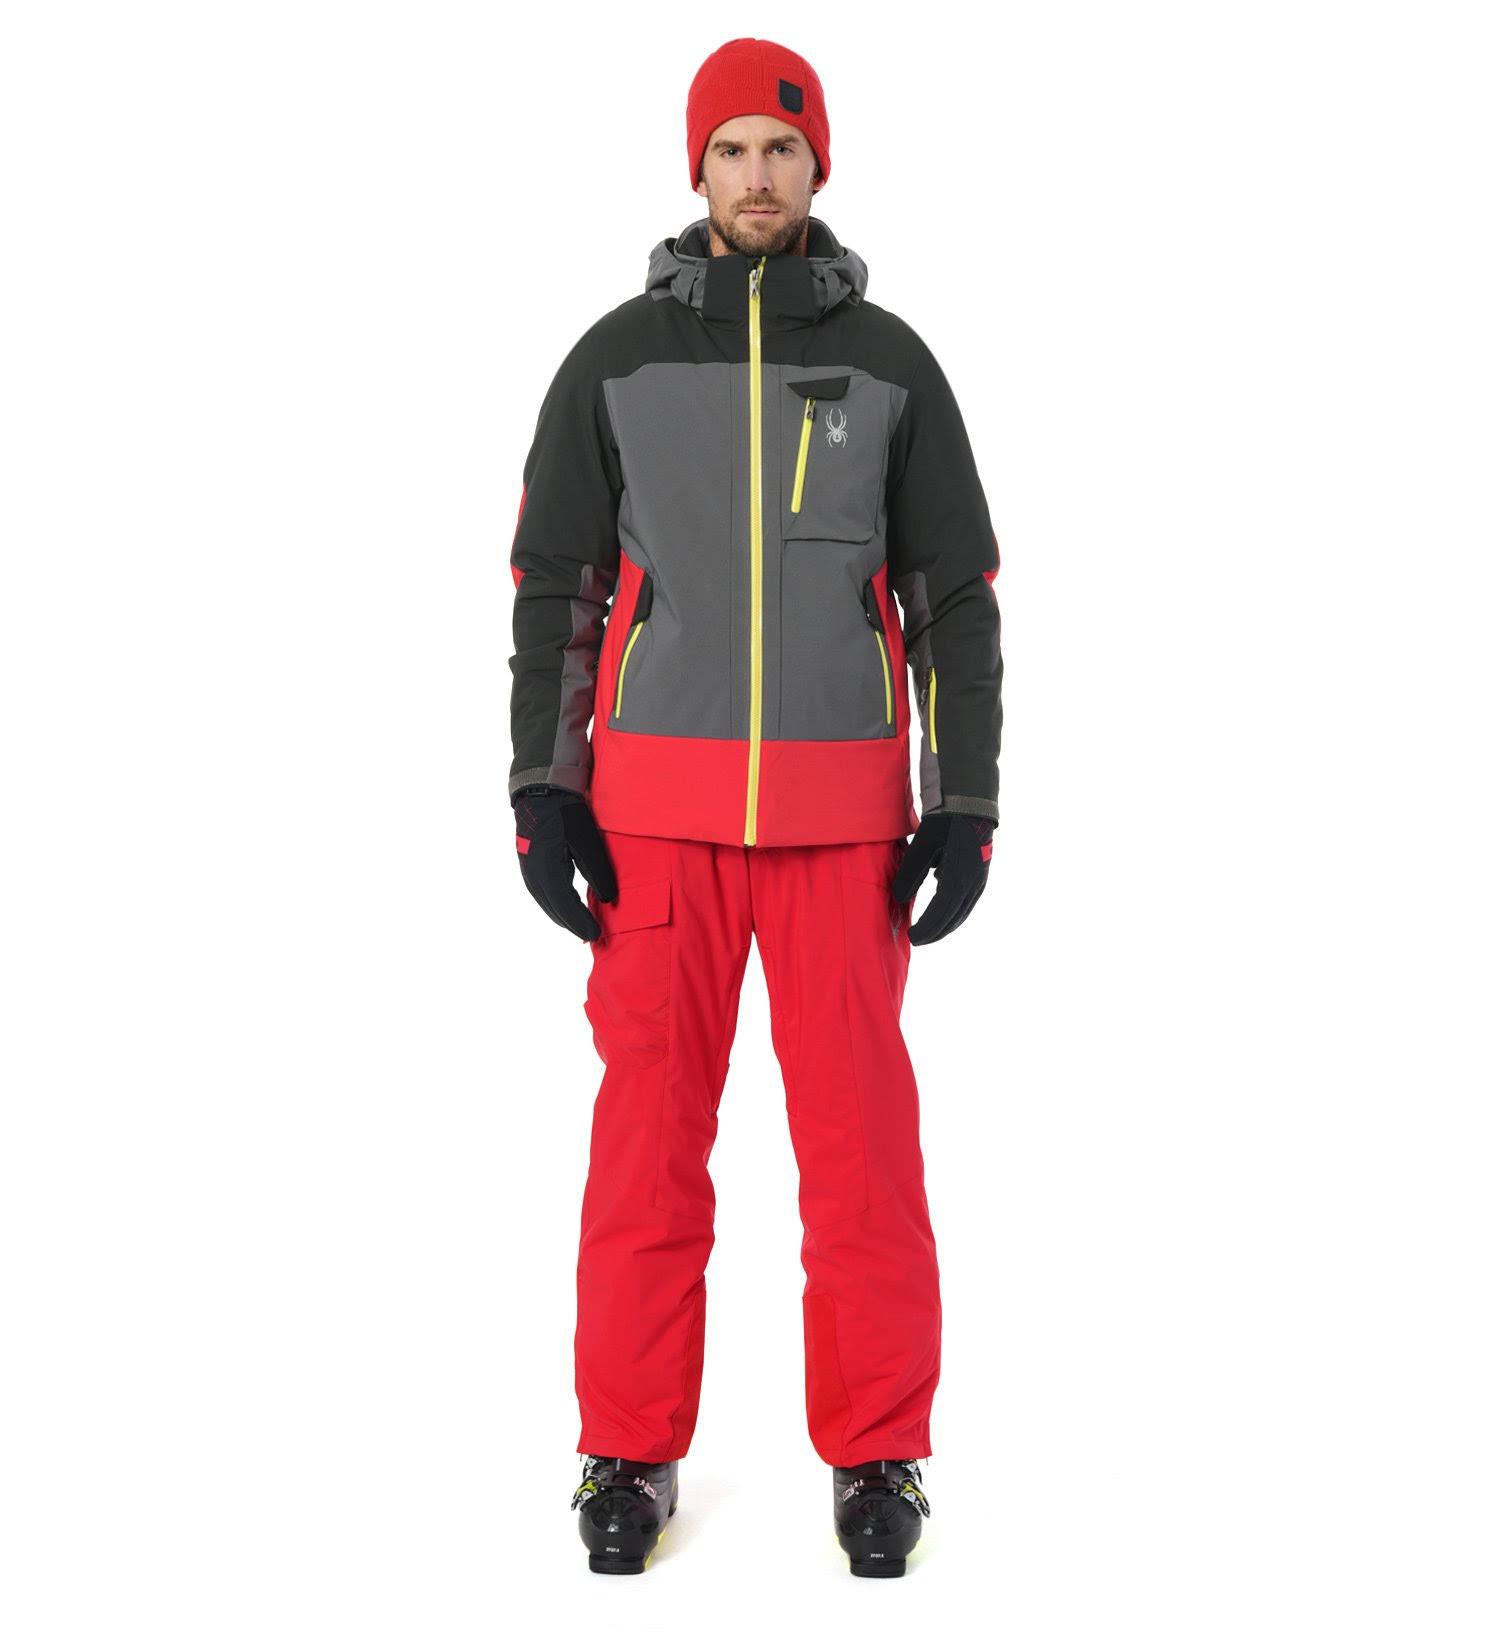 Spyder tex Gore skijacke skijacke tex Herrenschwungrad Herrenschwungrad Gore Spyder rwrPq0x